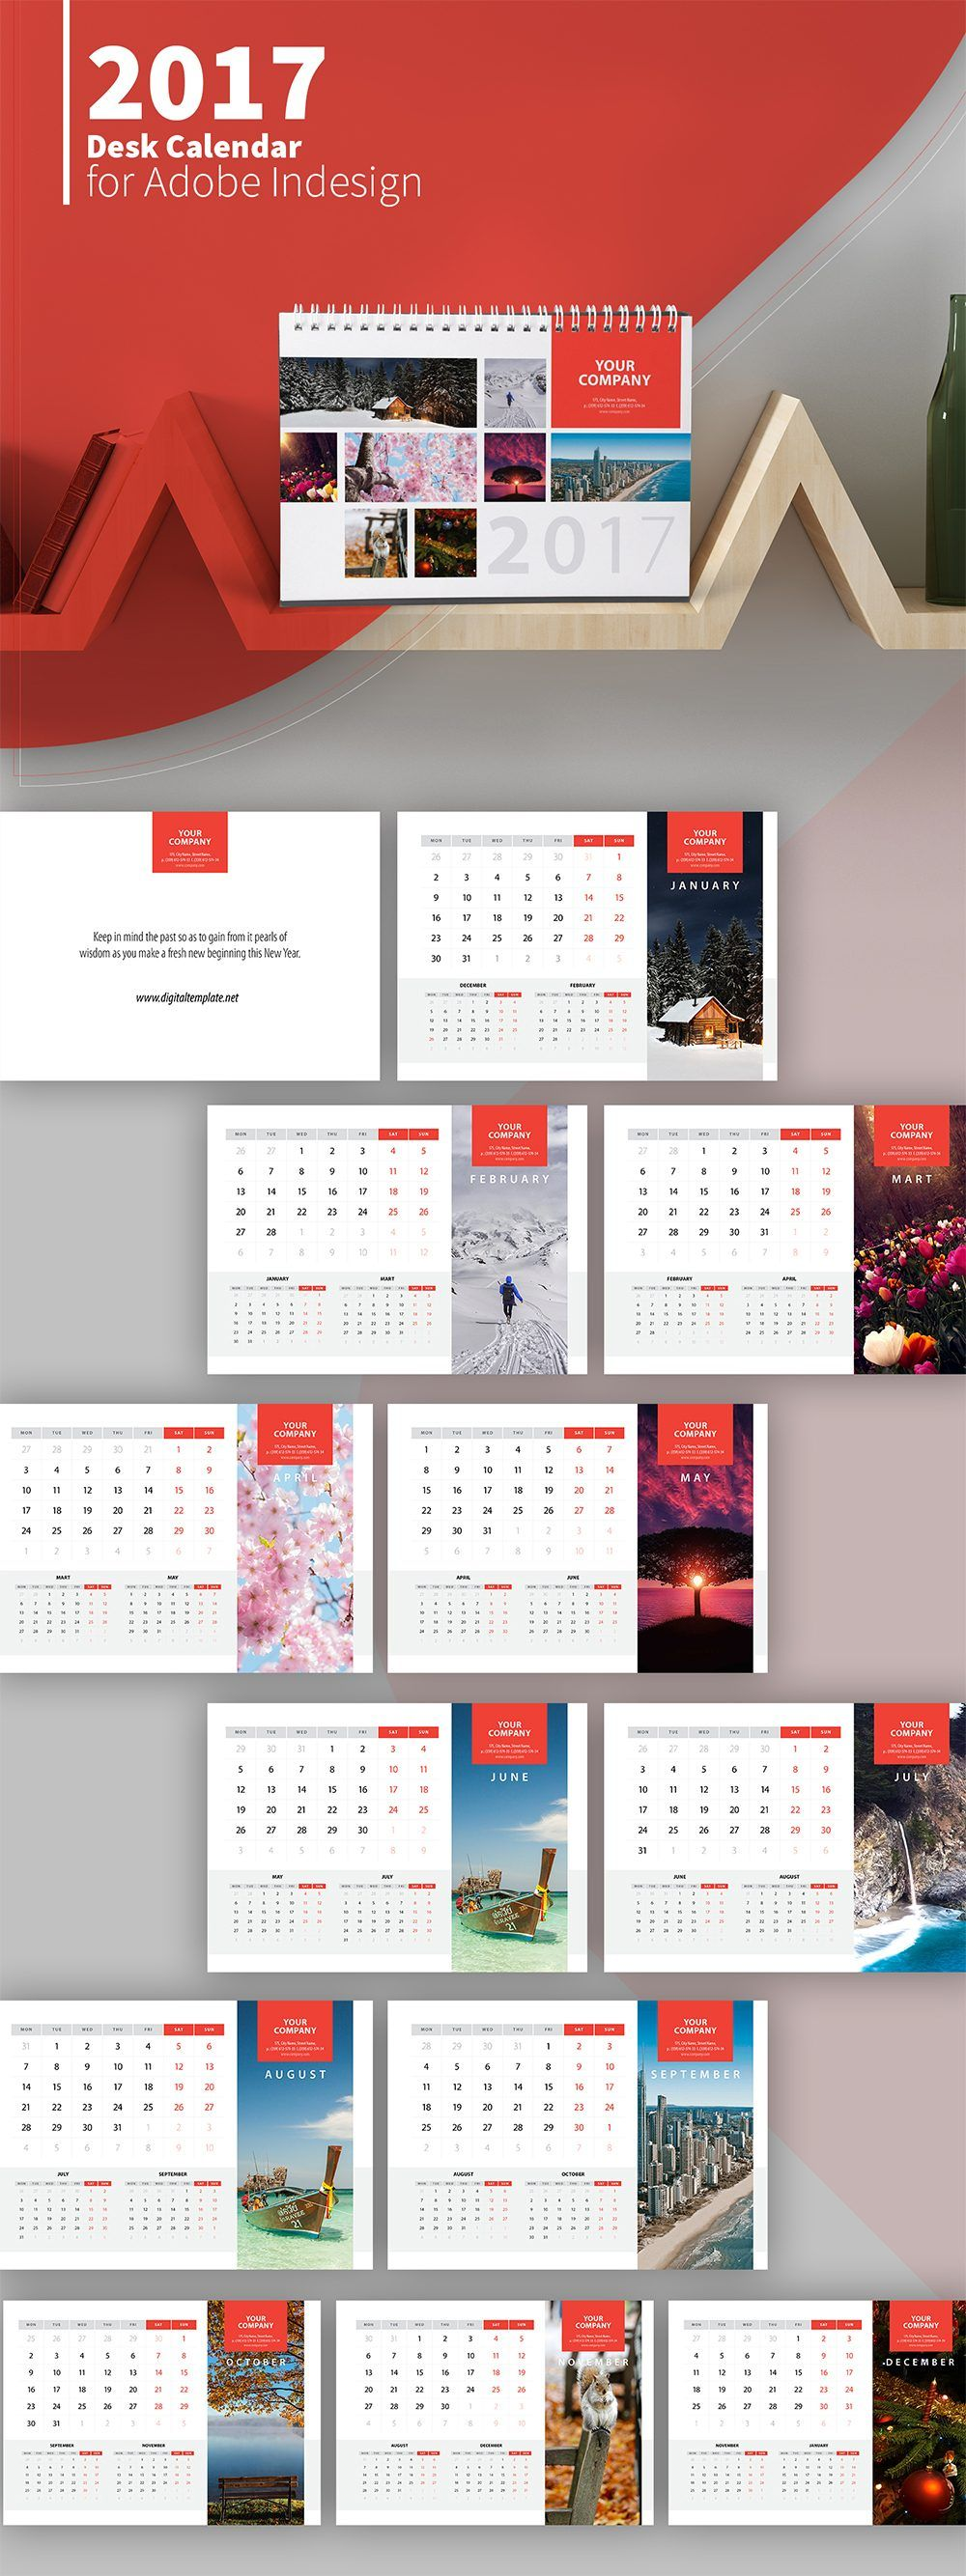 Pin de Digital Template Ltd en Calendars | Pinterest | Diseño de ...